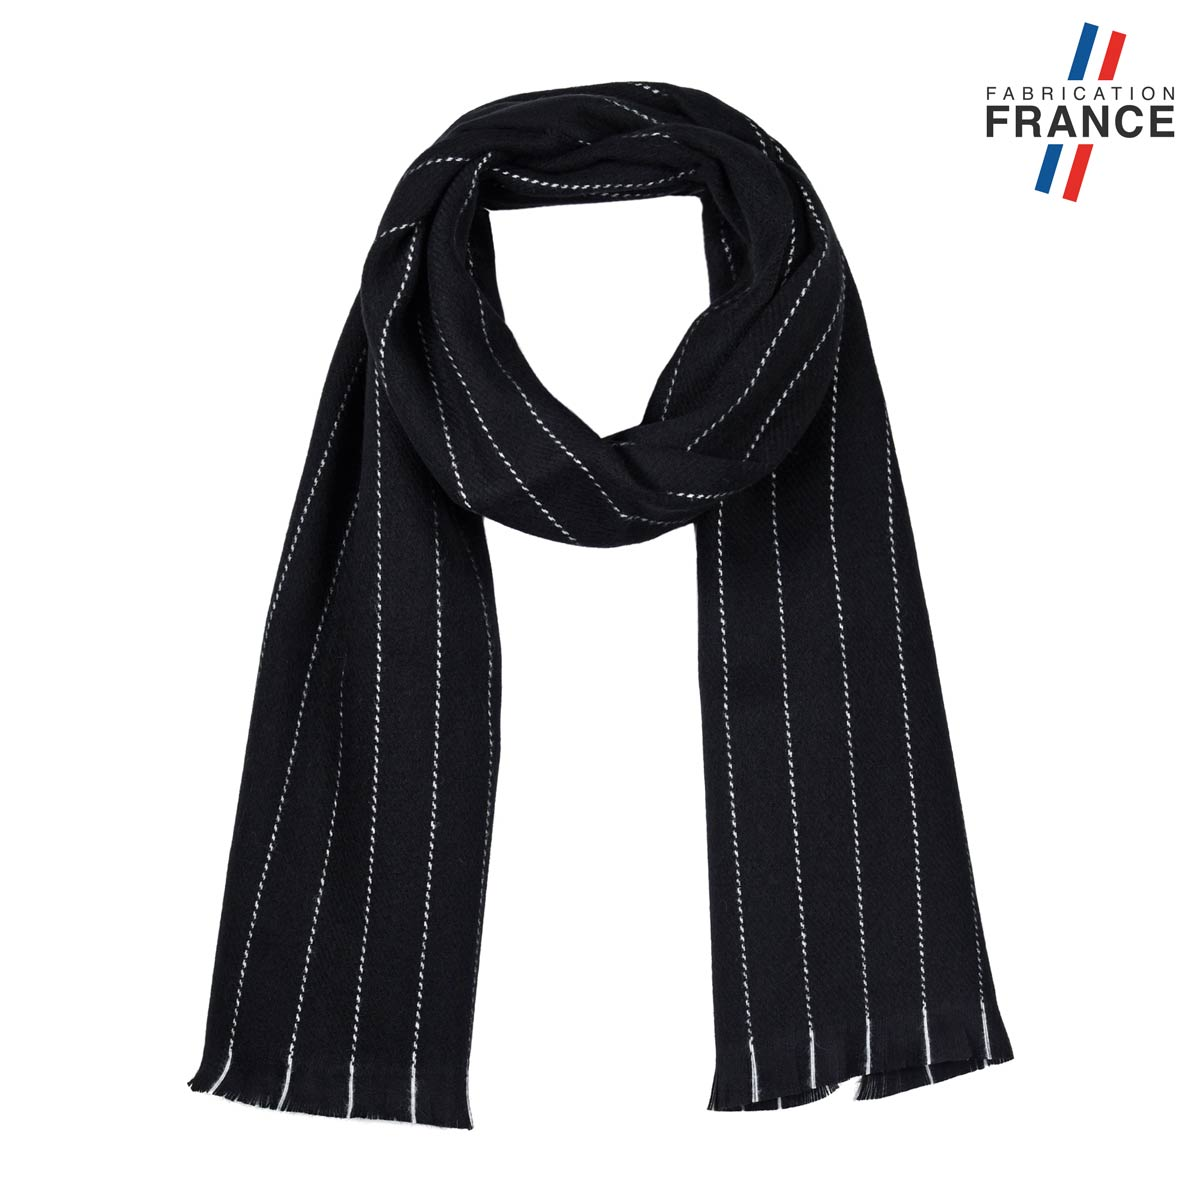 AT-05610_F12-1FR_Echarpe-noire-fabrication-francaise